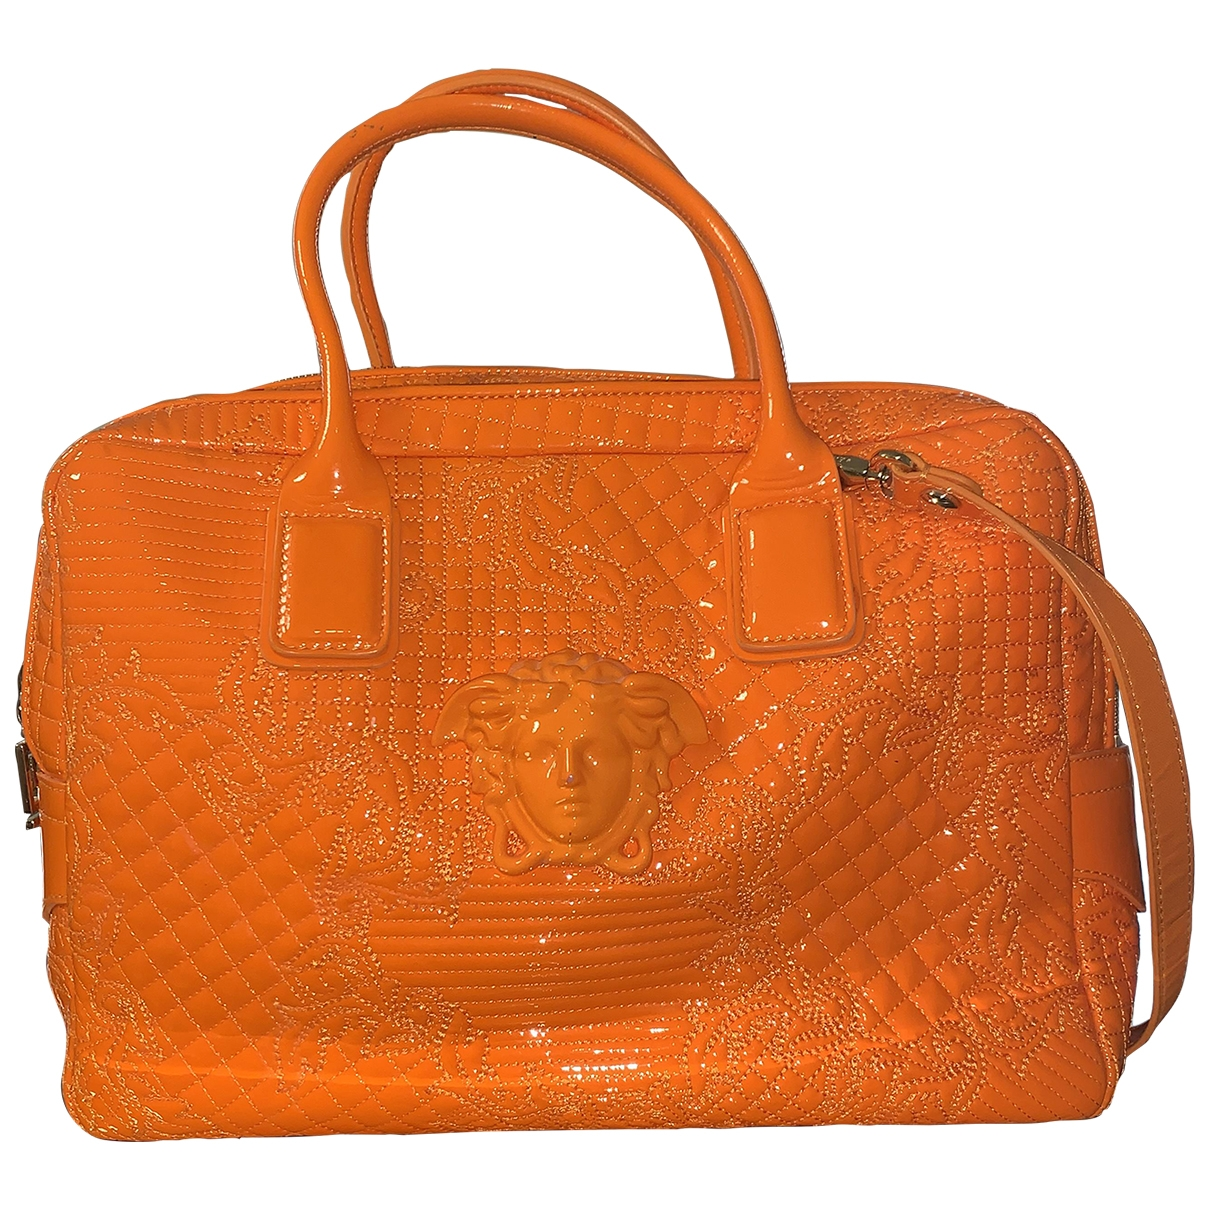 Bolso  de Charol Gianni Versace